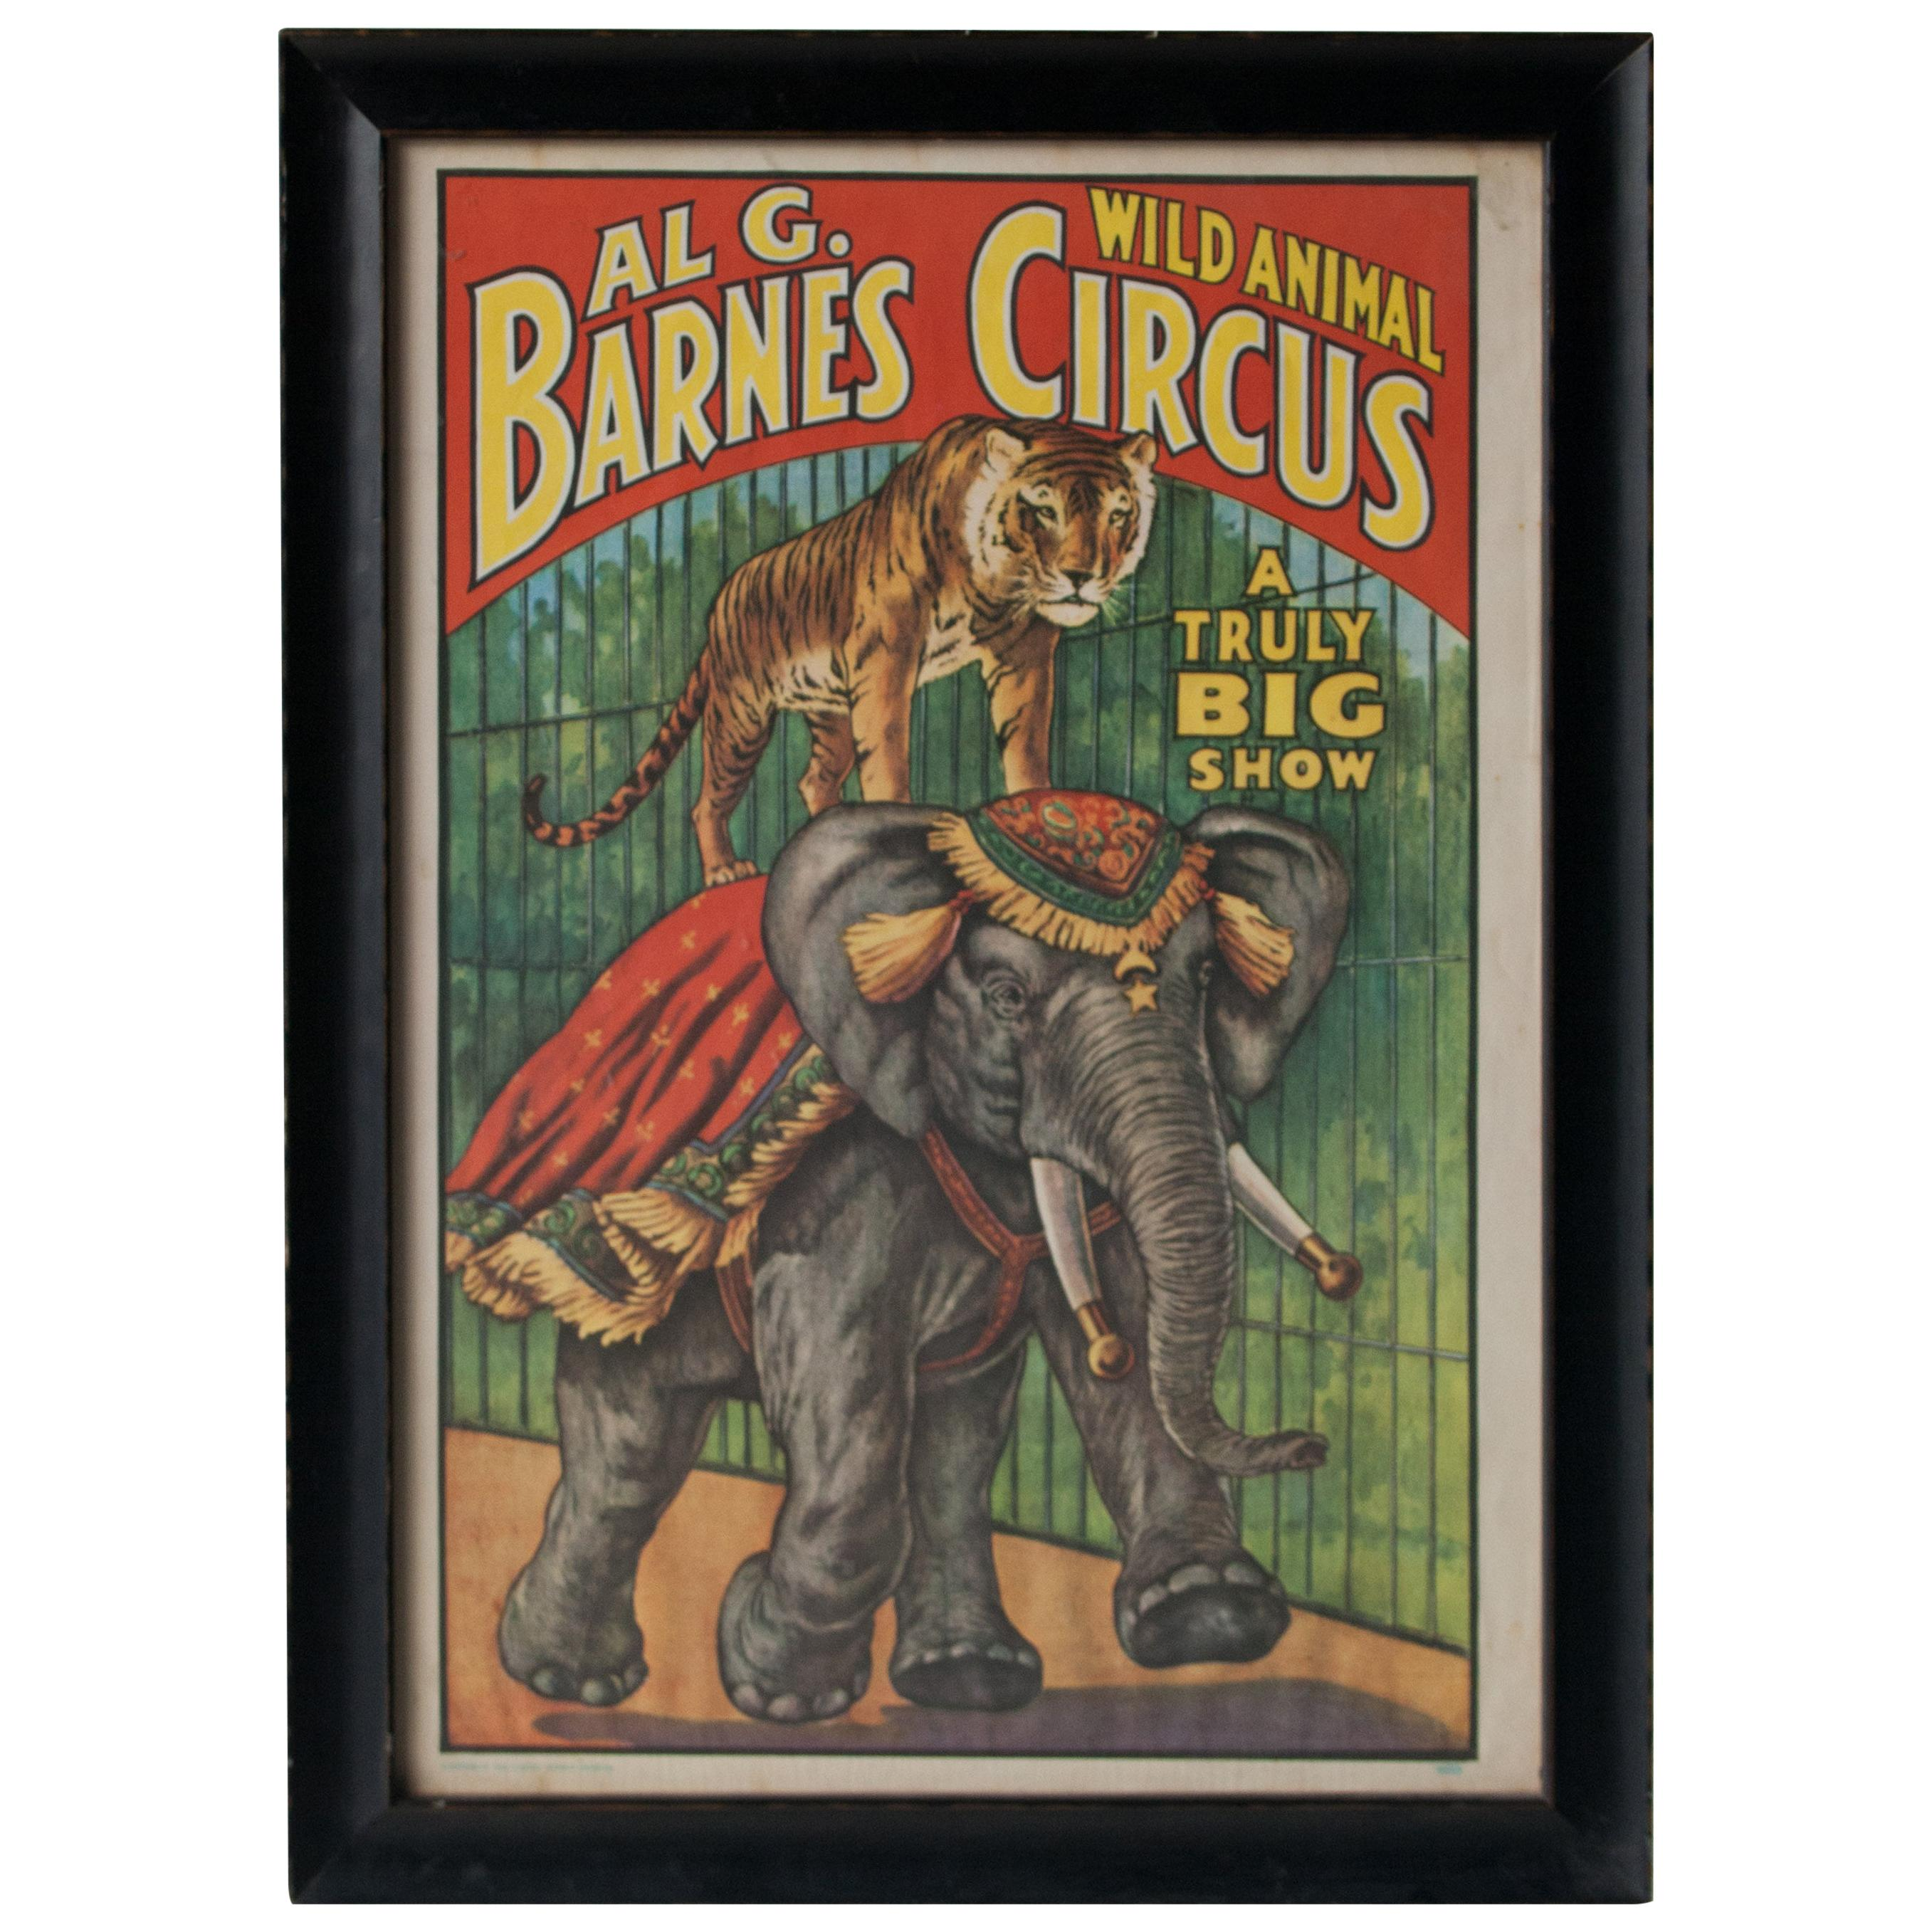 Al G. Barnes Animal Show Circus Original Poster Framed, United States, 1895